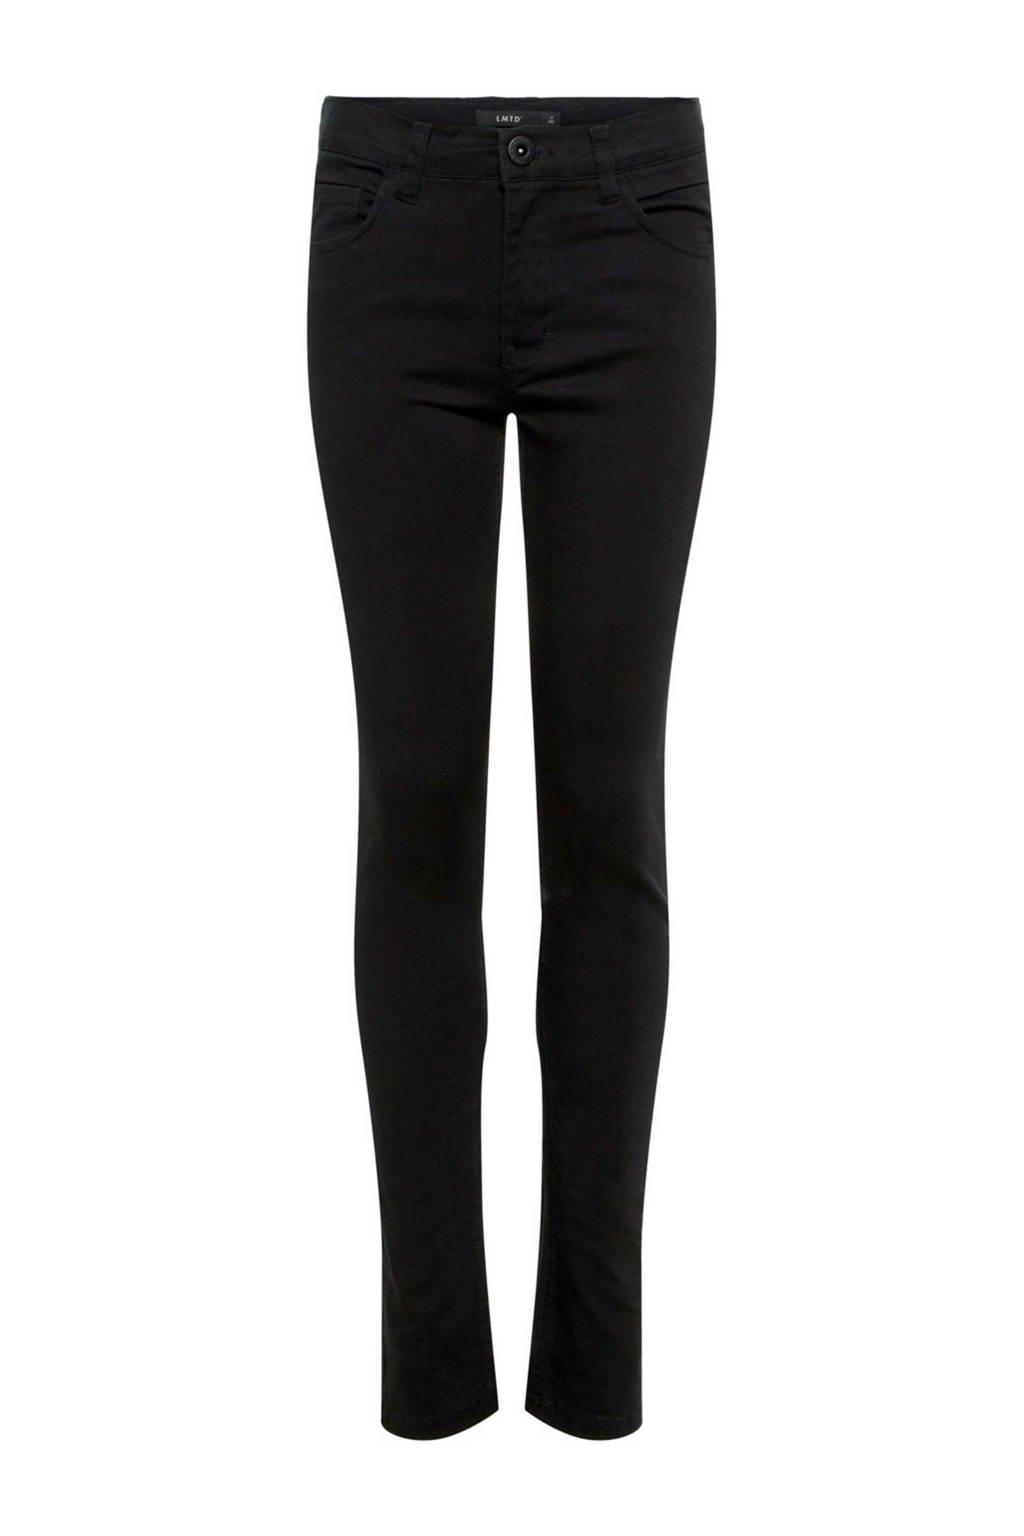 LMTD skinny fit jeans Pilou zwart, Zwart